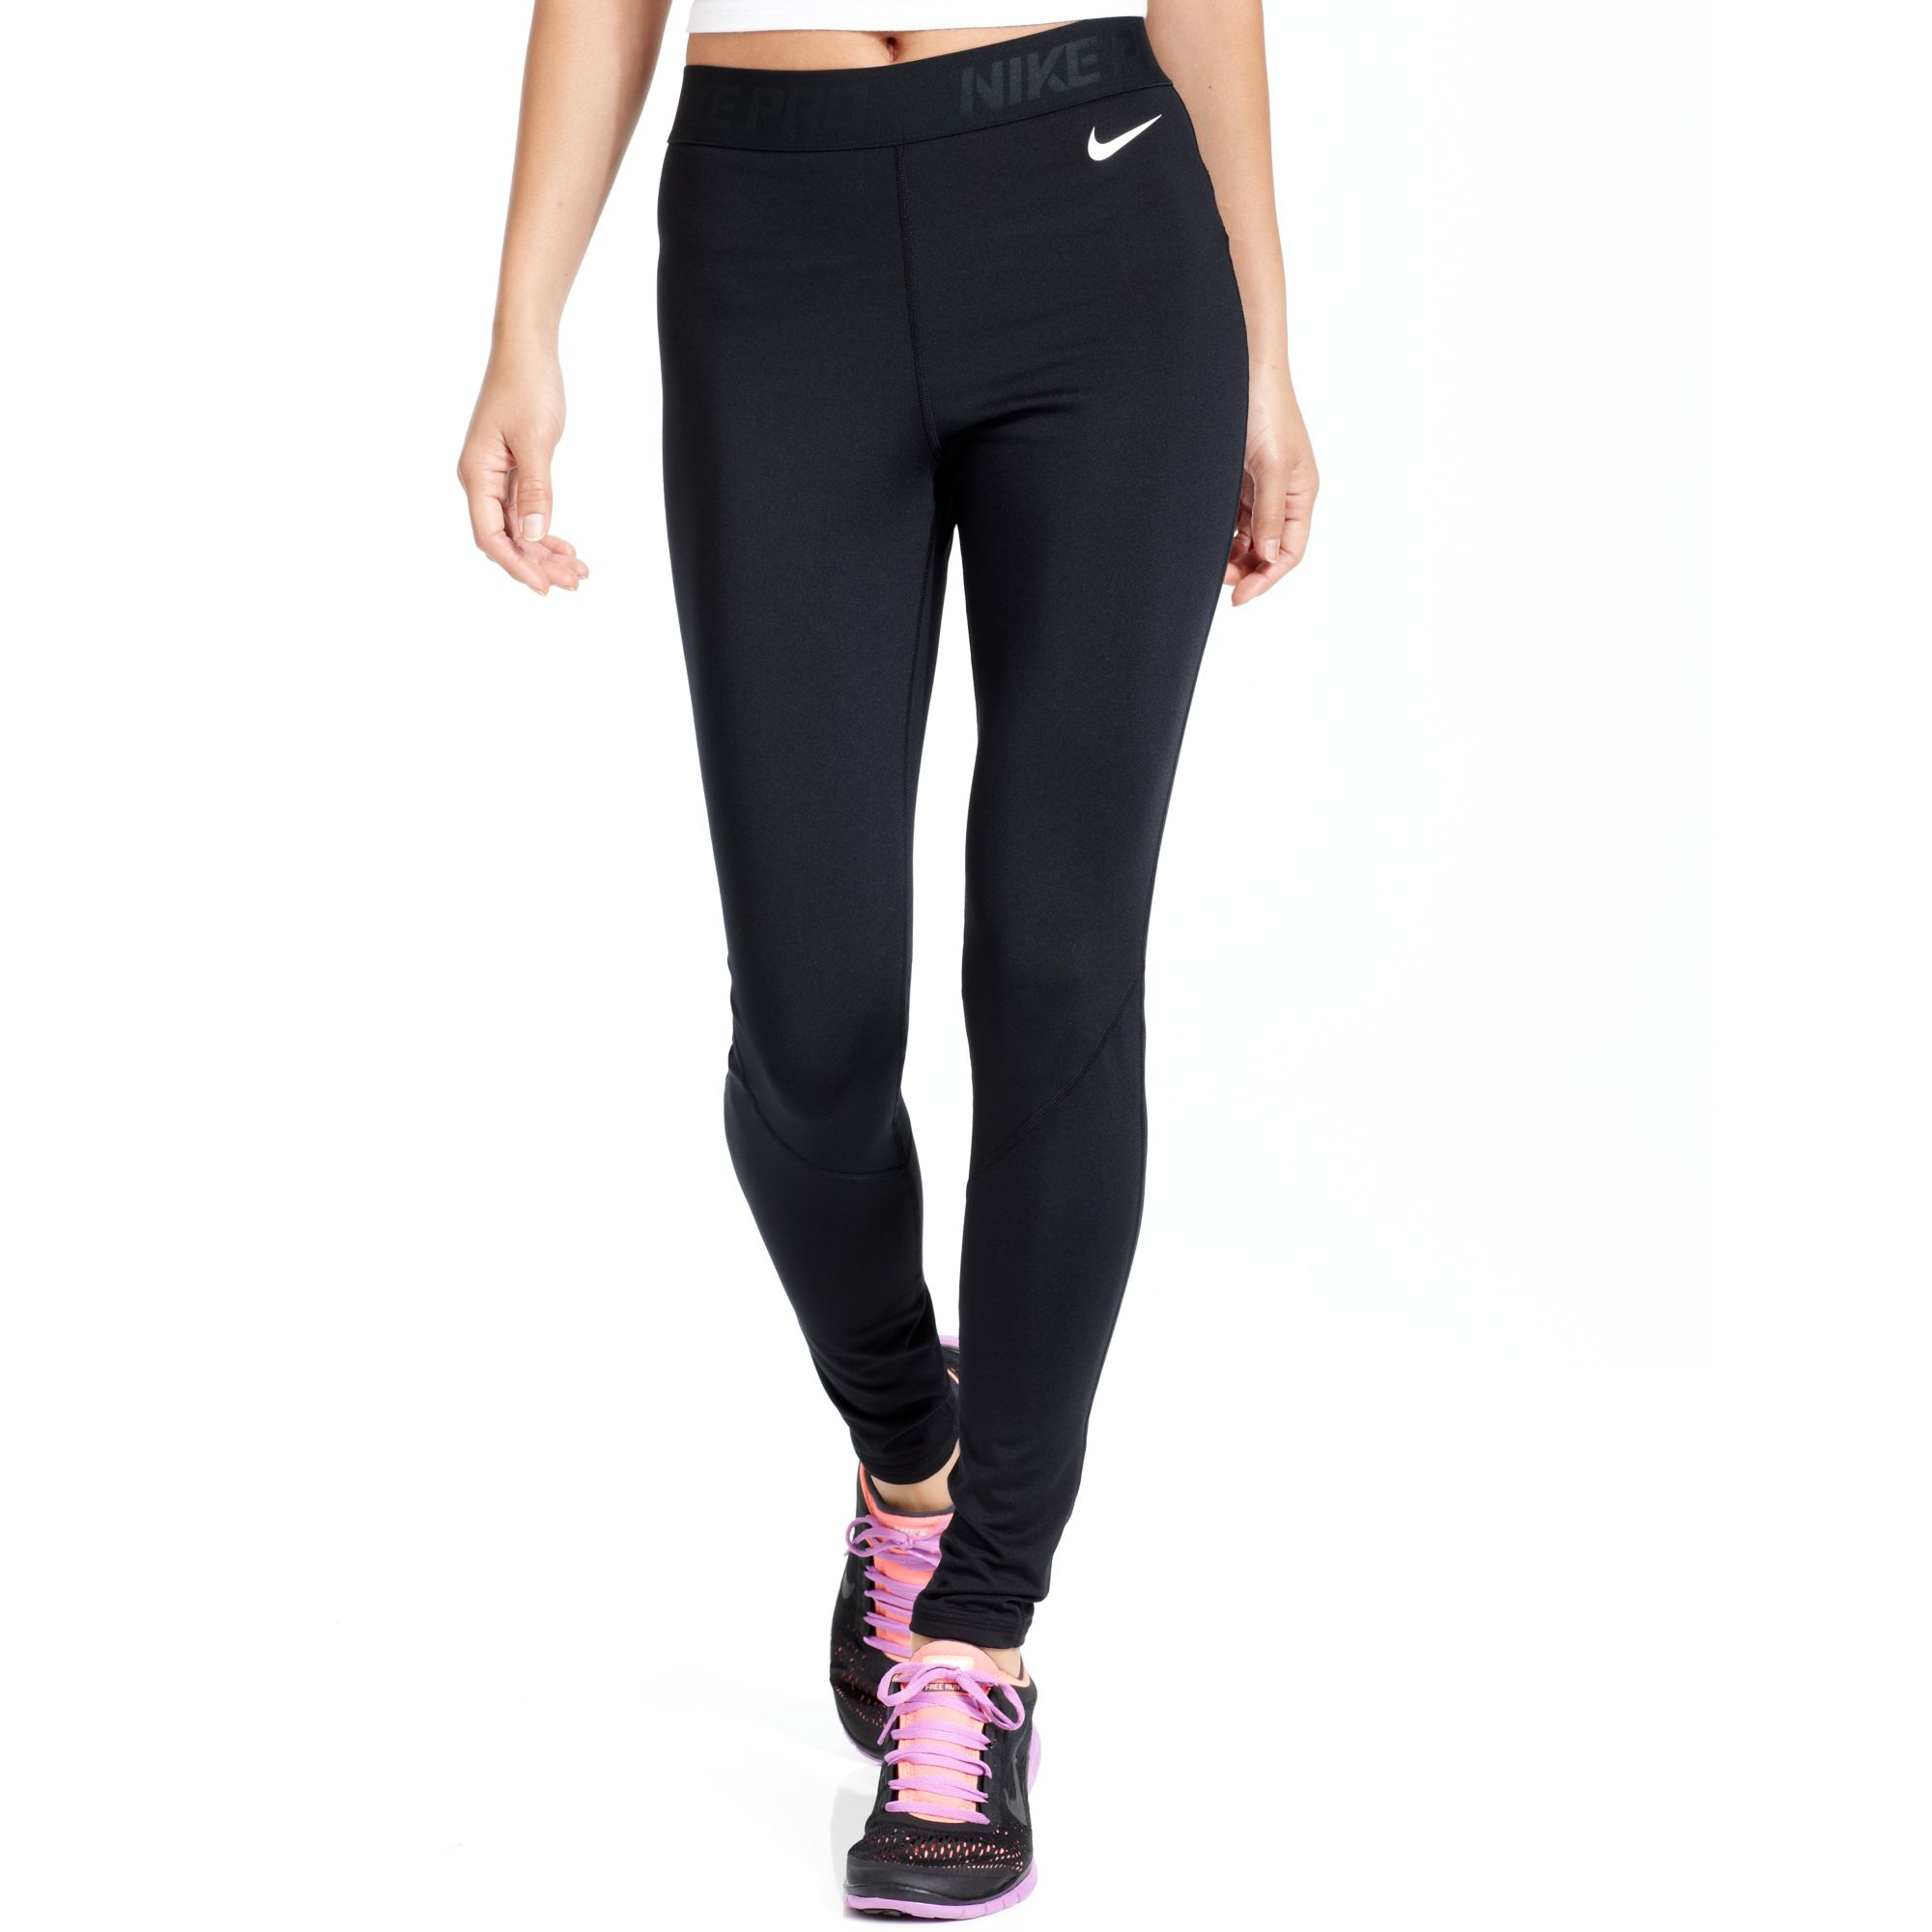 Nike Prohyperwarm Drifit Running Leggings in Black | Lyst